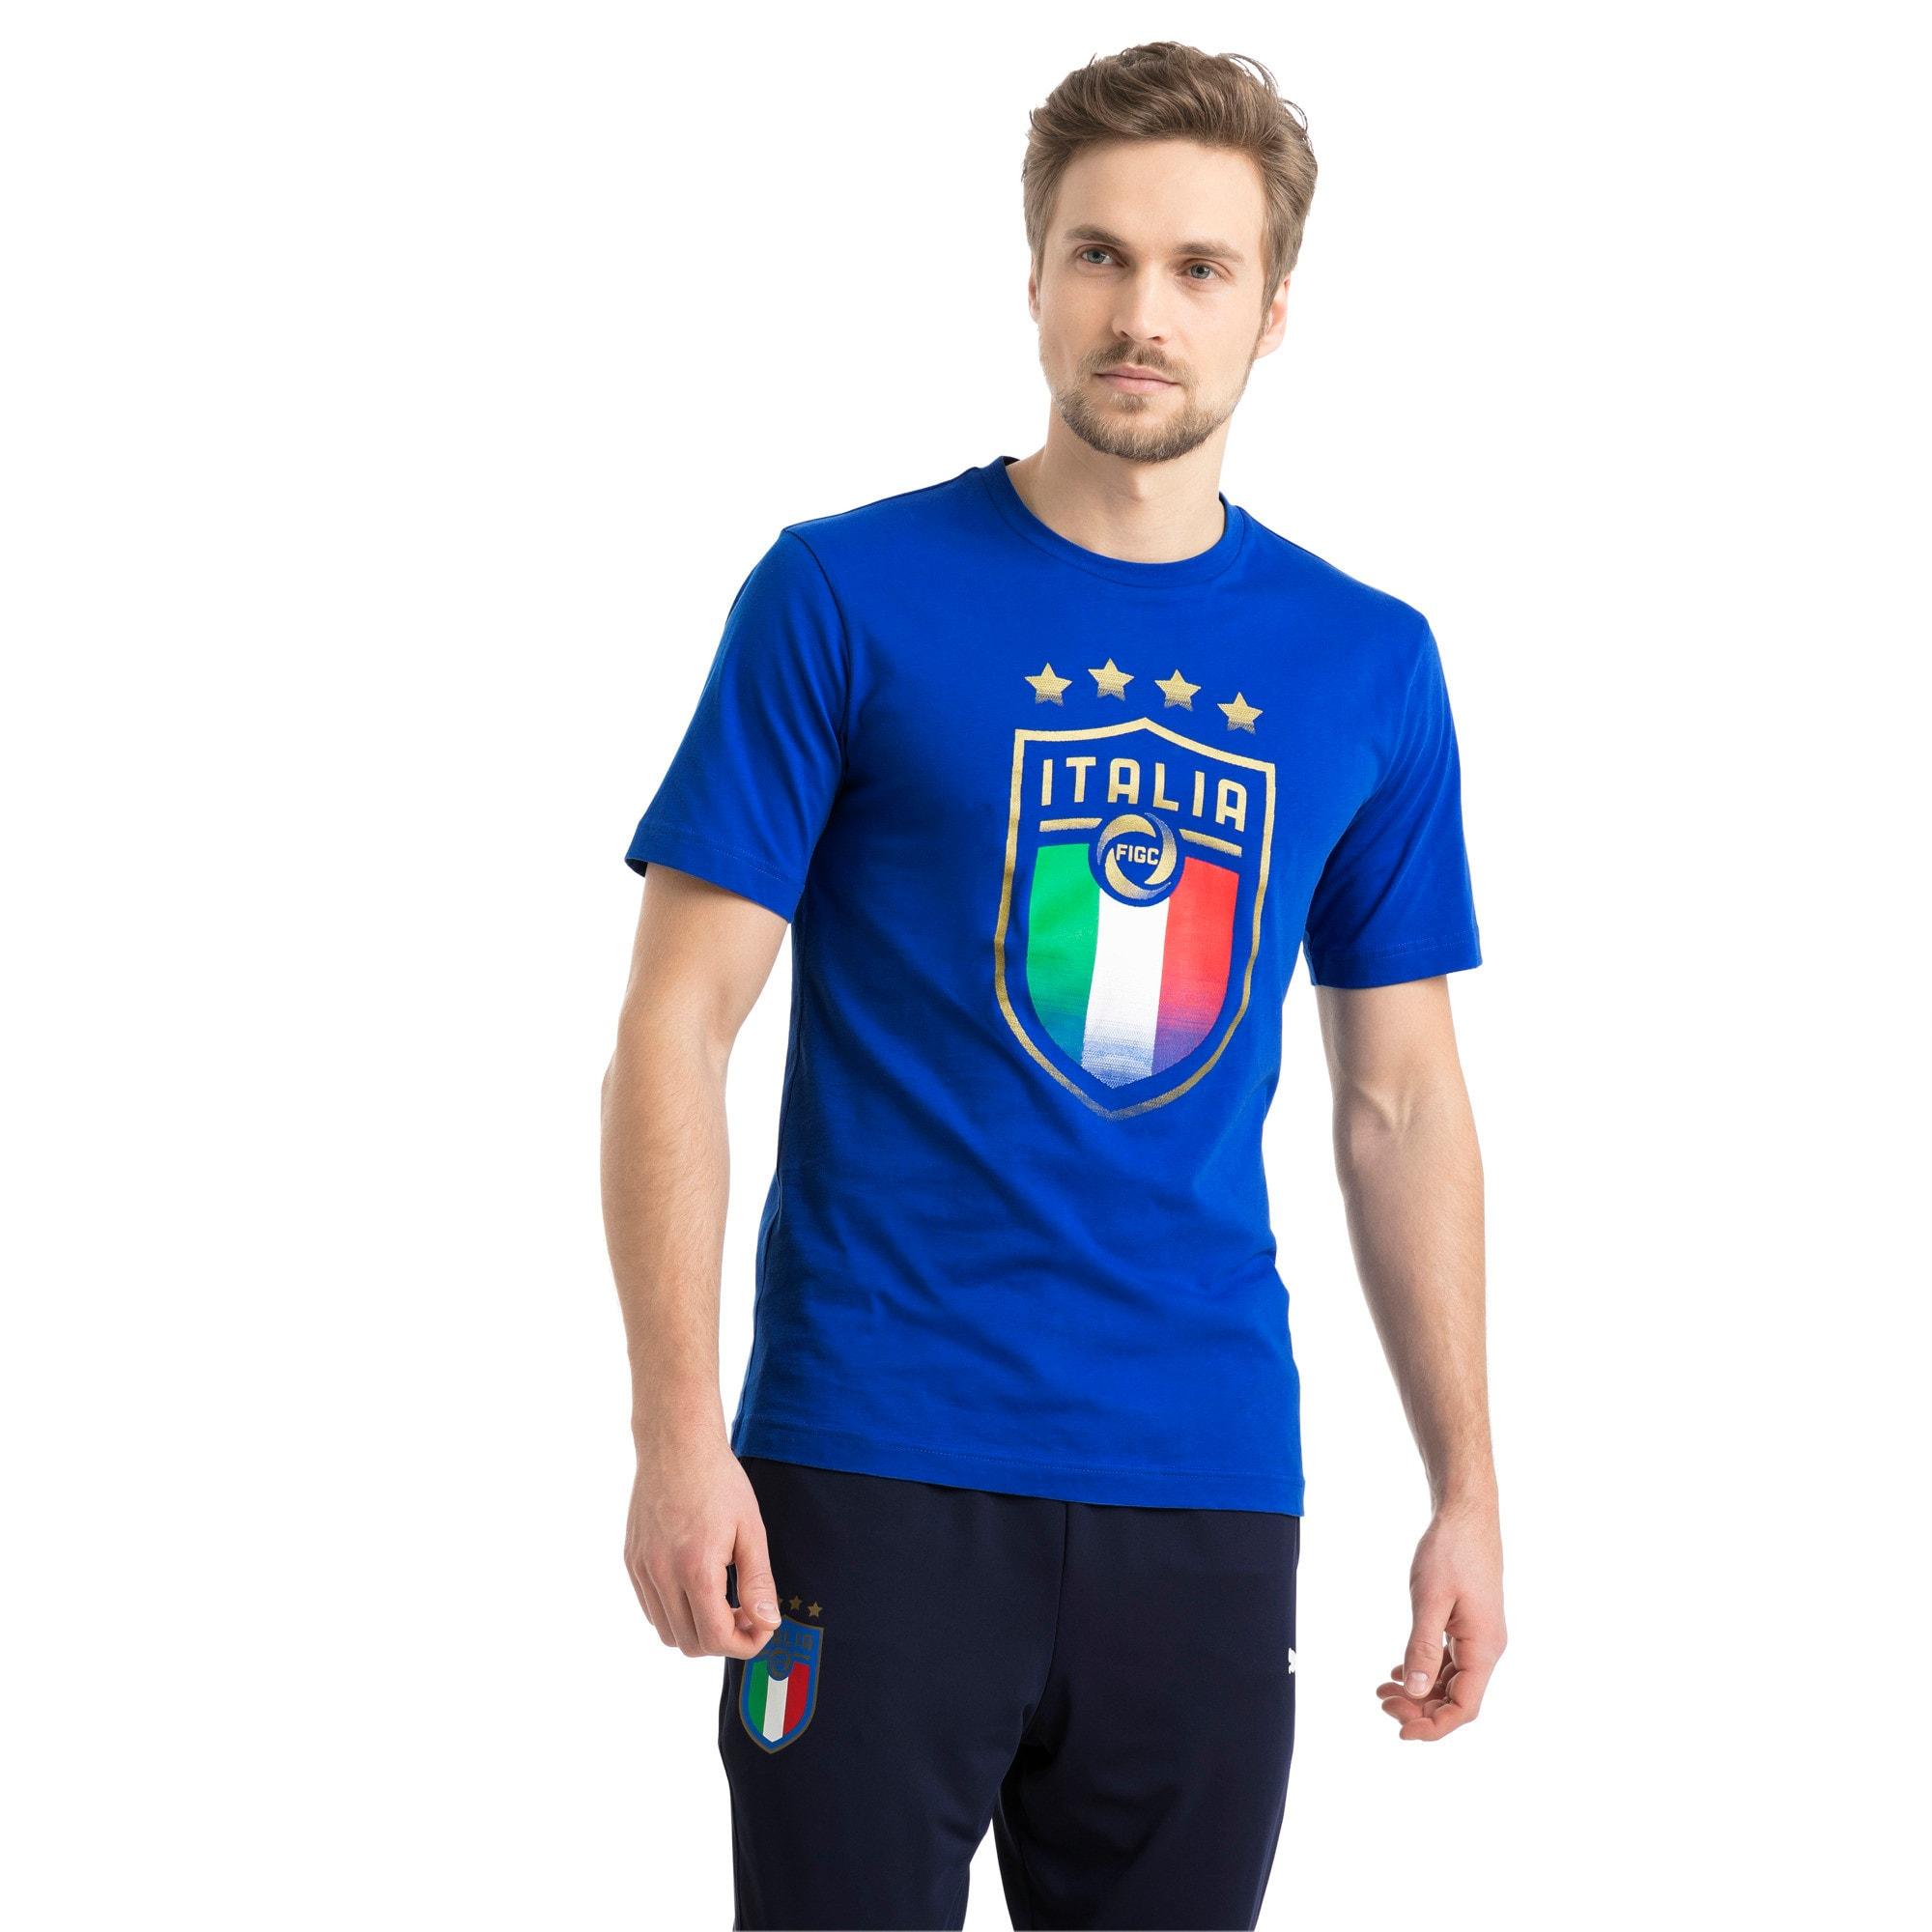 Thumbnail 2 of Italia Wappen T-Shirt, Team Power Blue, medium